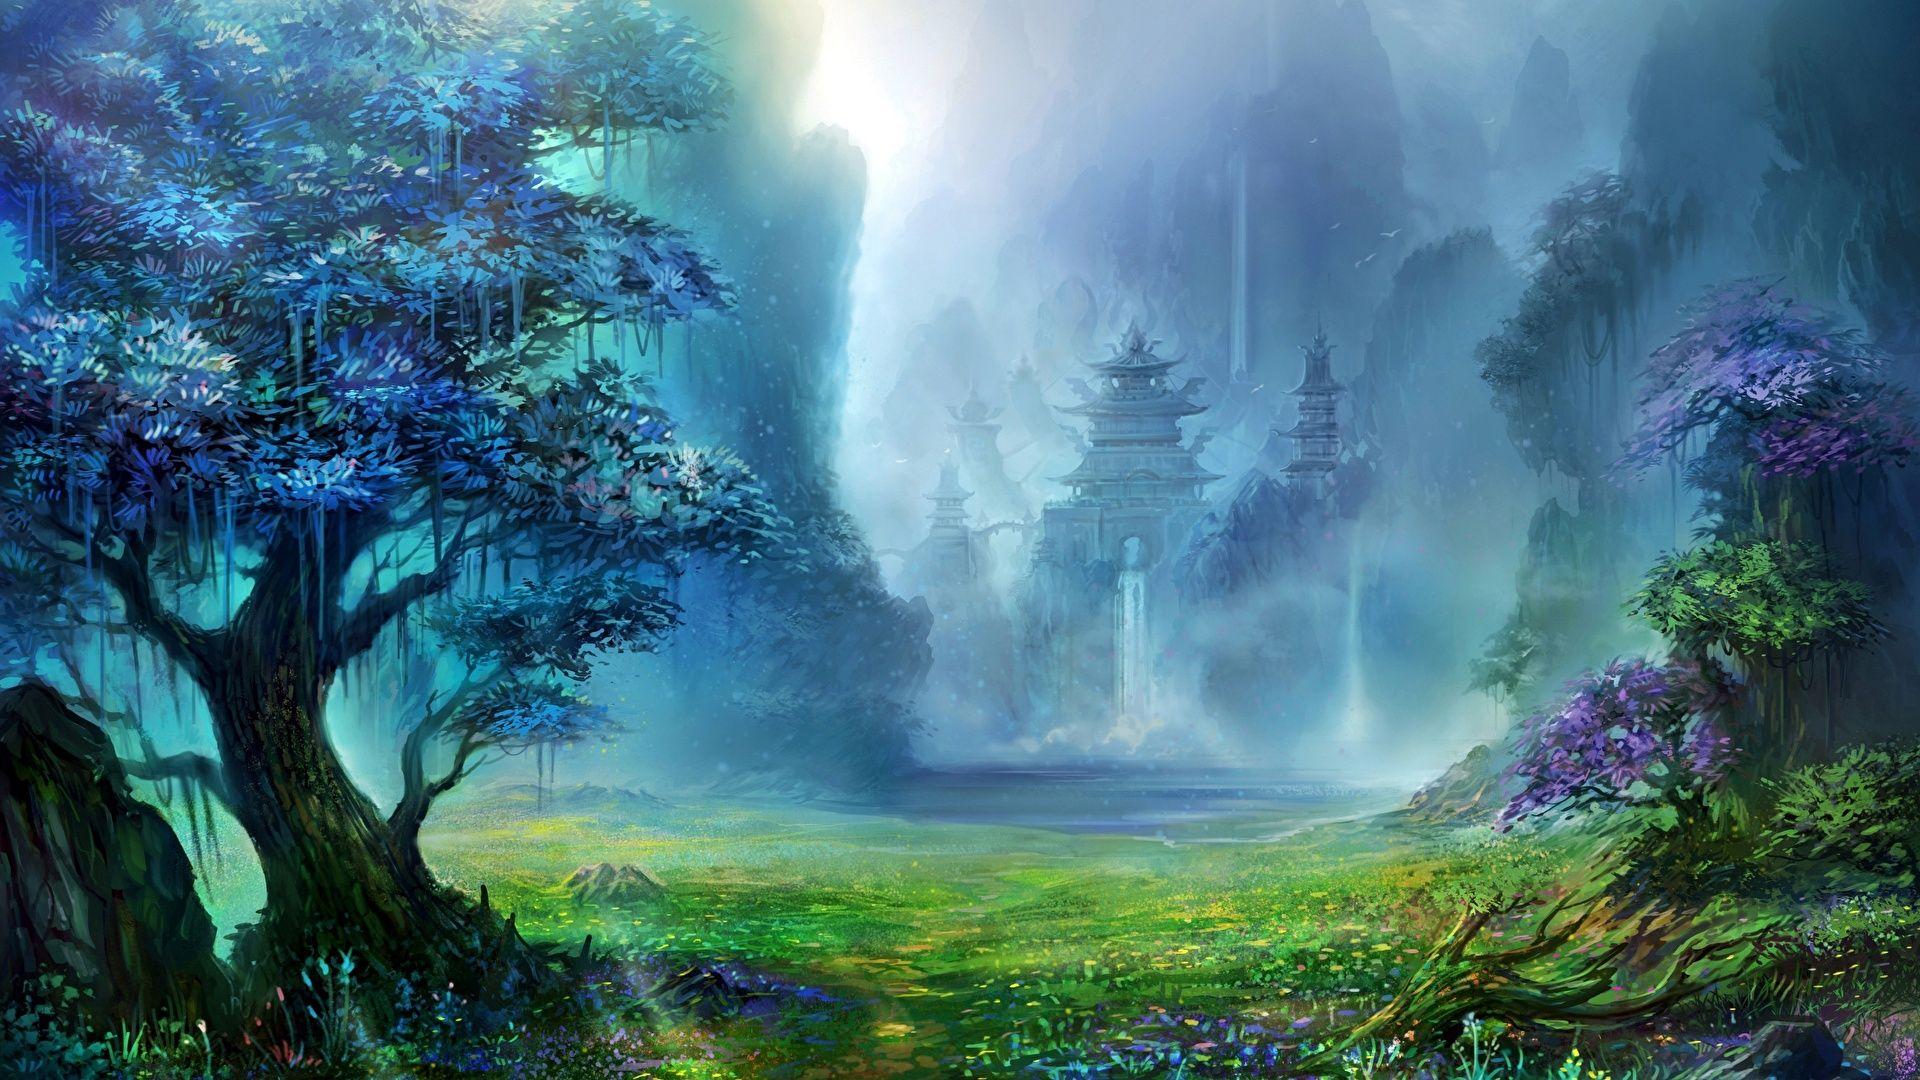 19x1080 幻想的な世界 城 木 ファンタジー ファンタジーな風景 風景の壁紙 ランドスケープアート